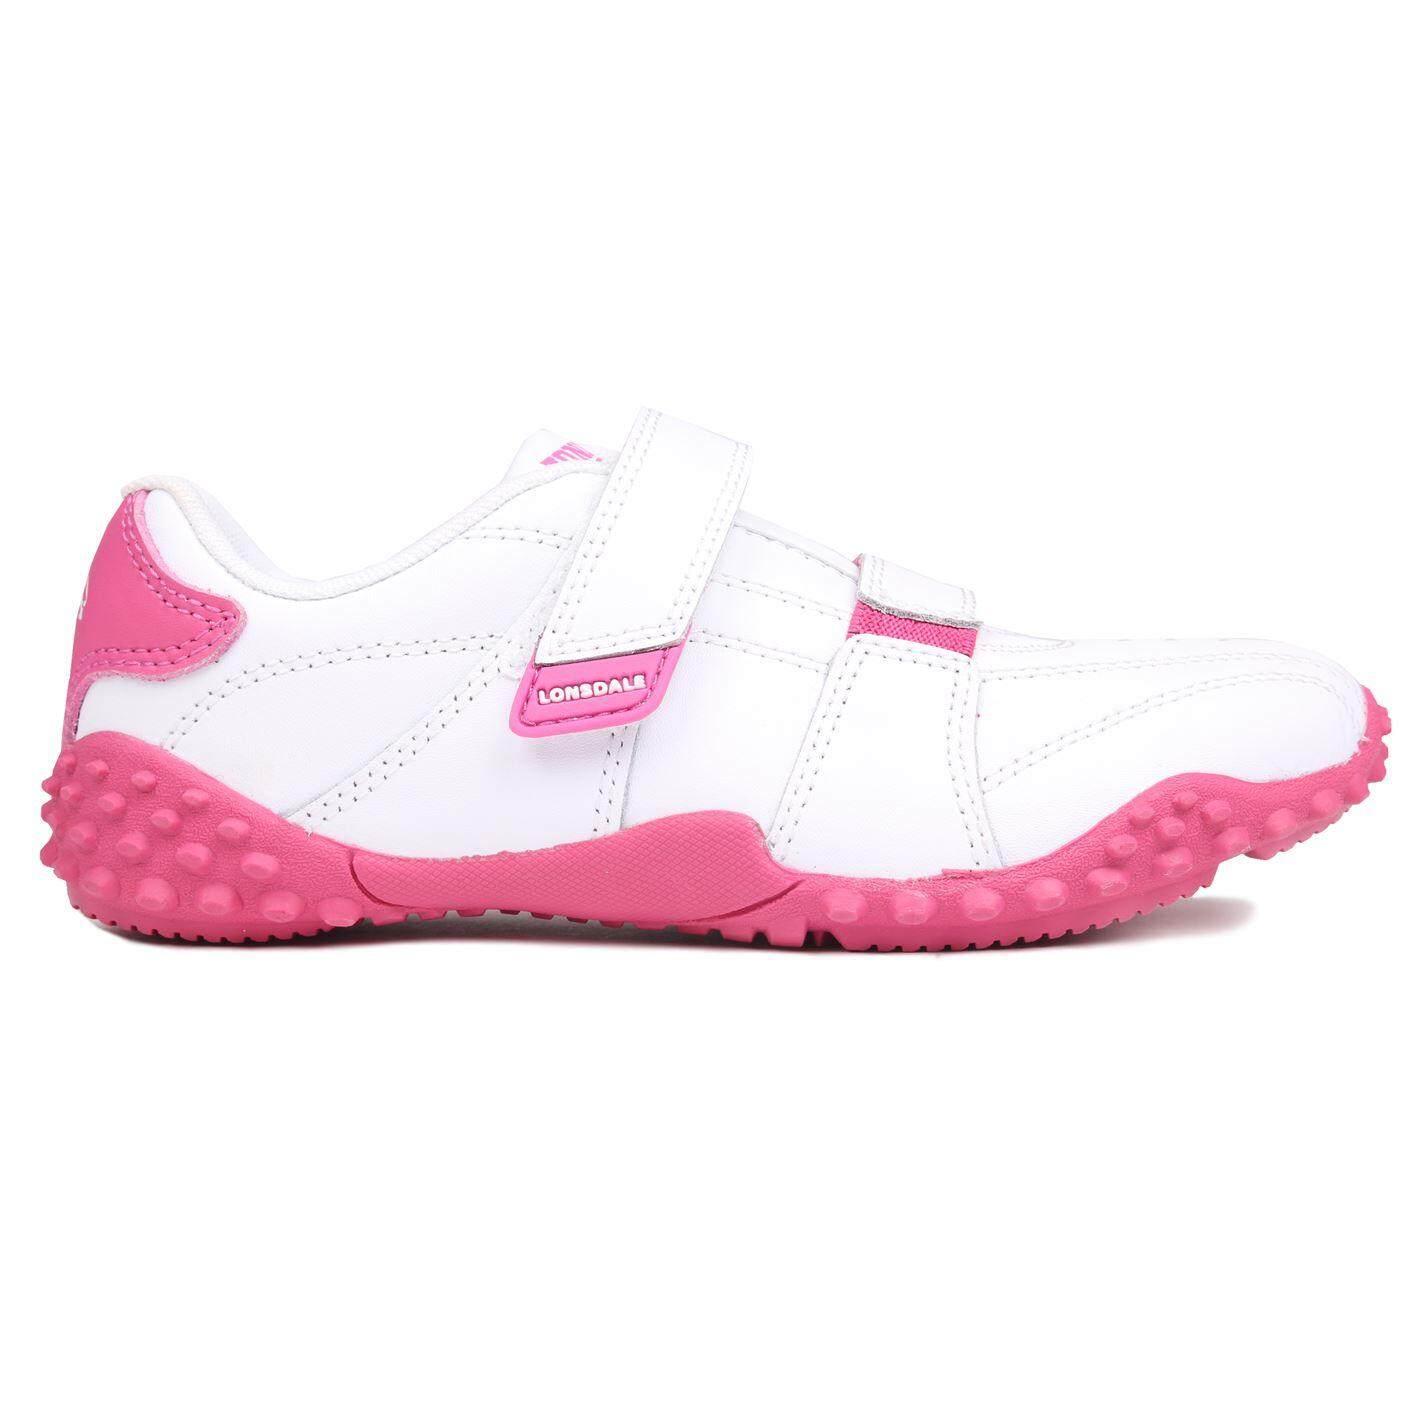 9a9e2bd9213c95 Girls  Multi-Purpose Sport Shoes - Buy Girls  Multi-Purpose Sport ...